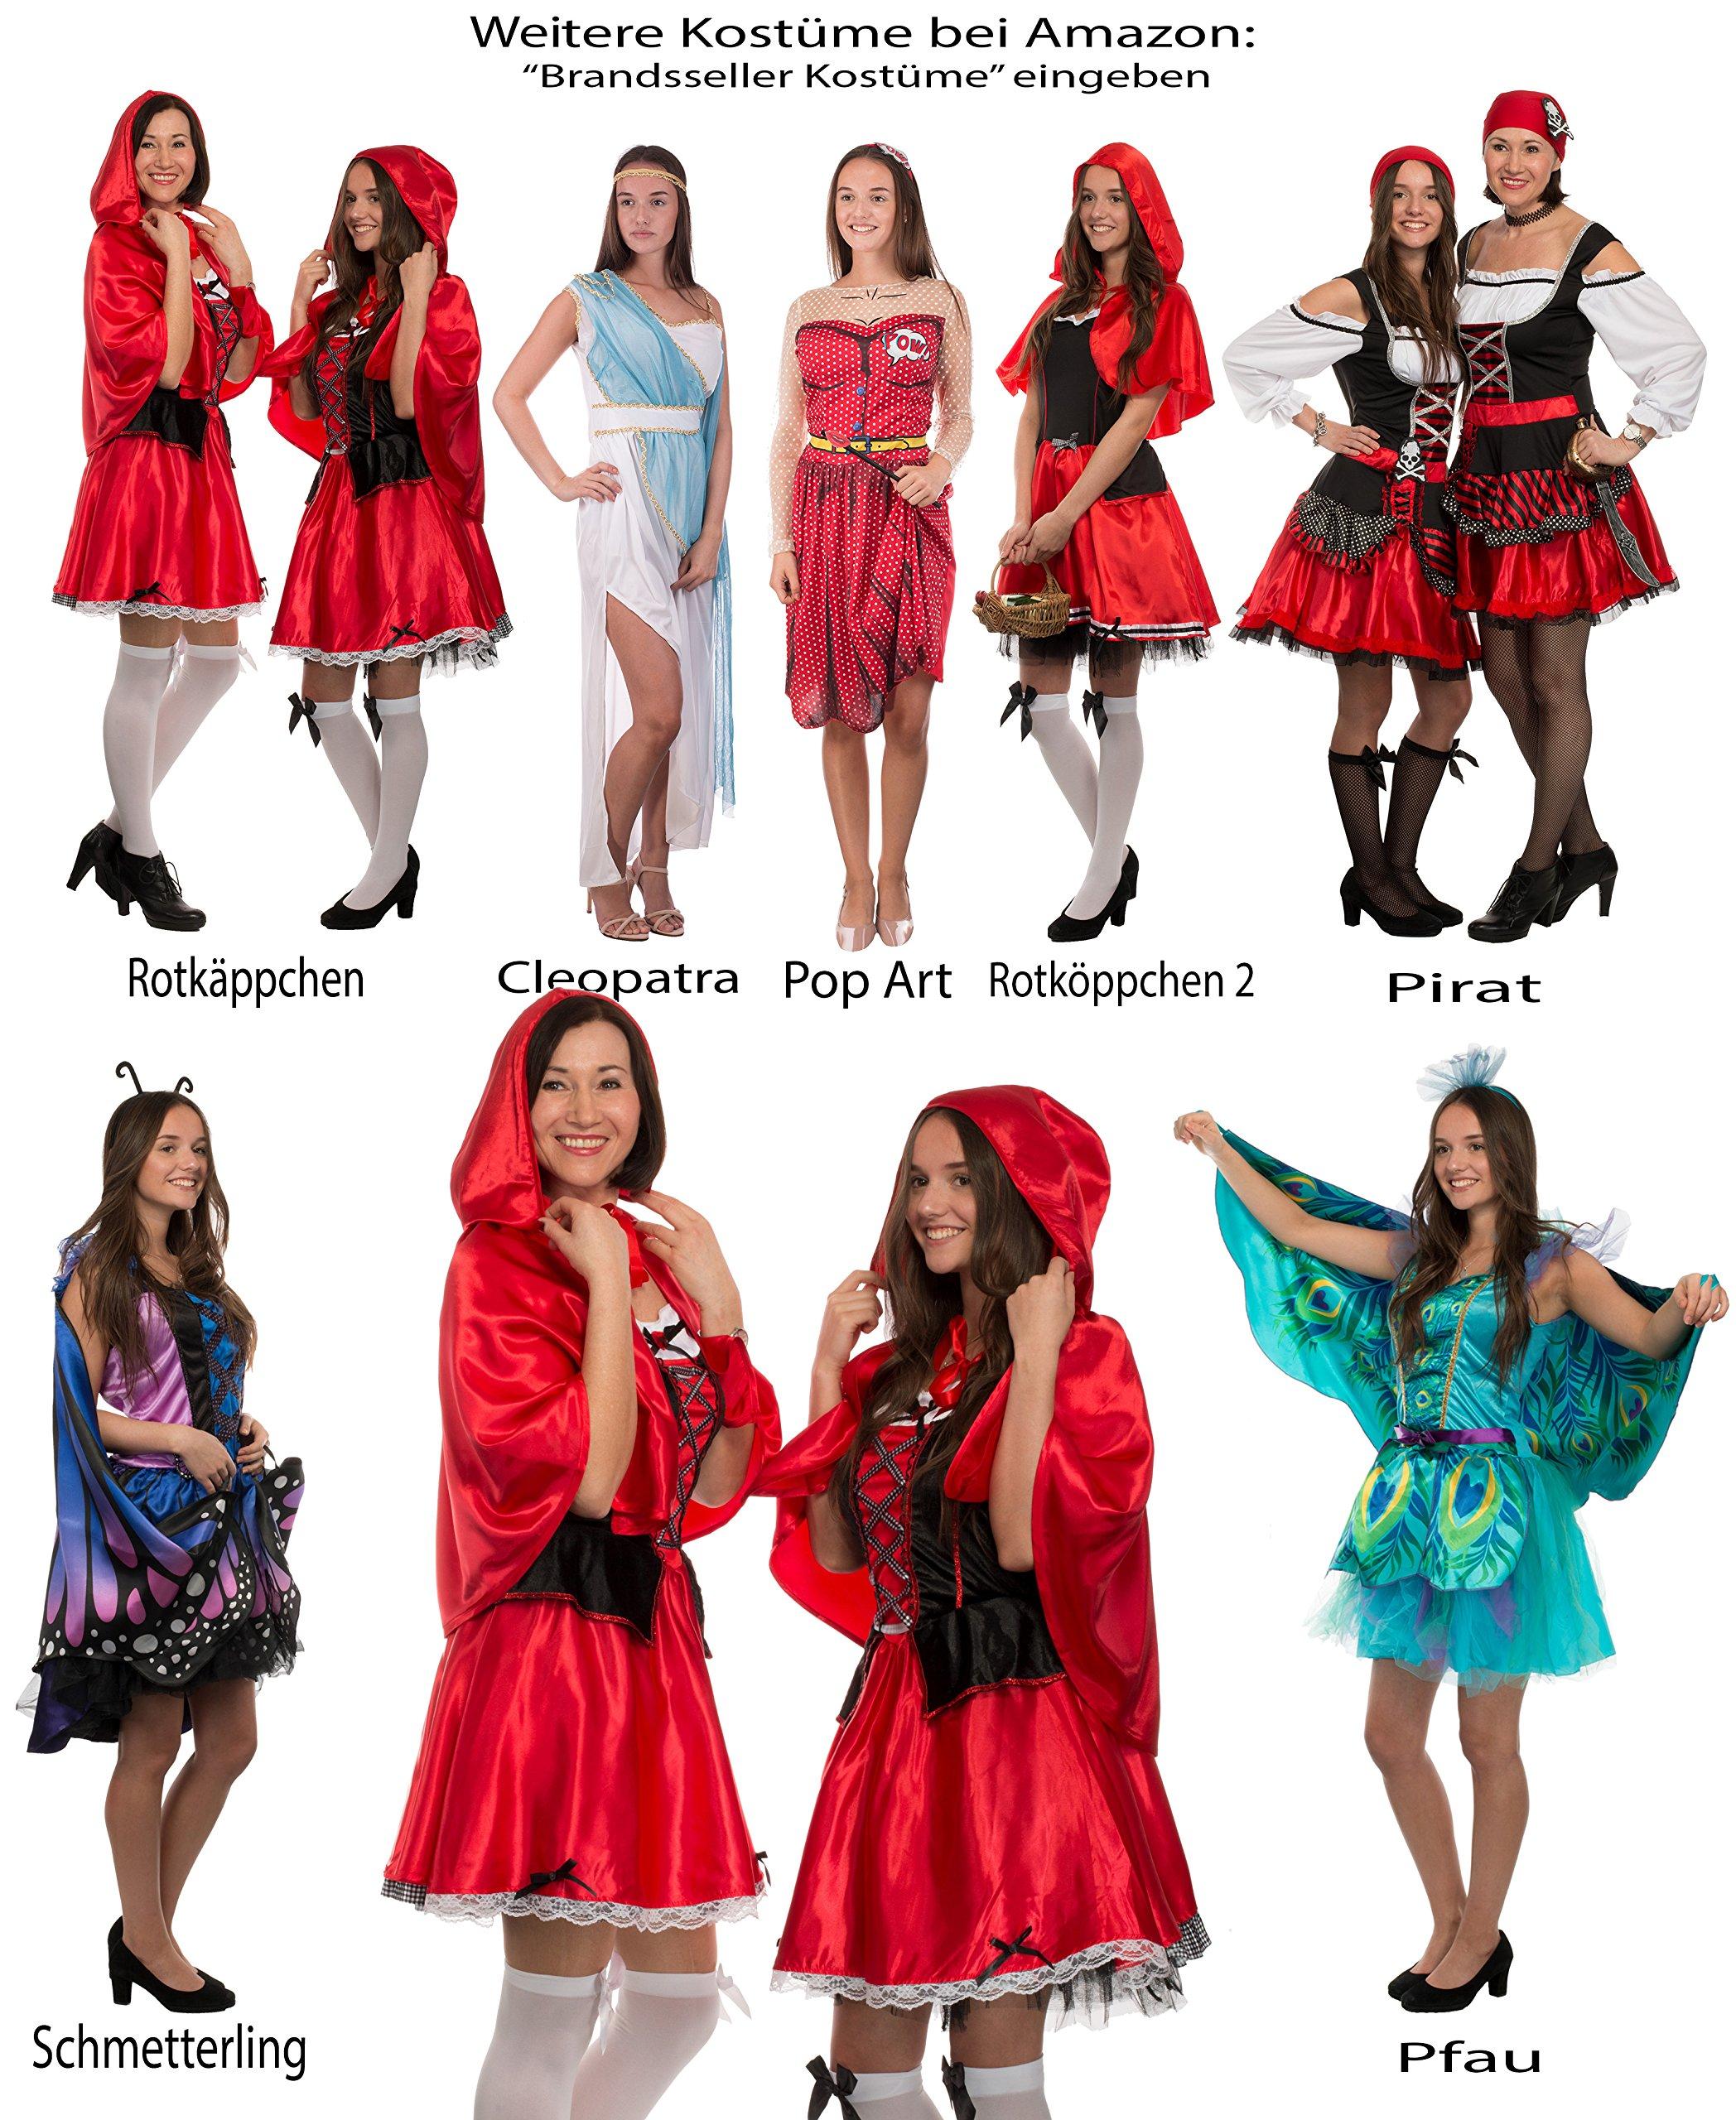 b4fdfdf3fb839 Brandsseller Karneval Damen Kostüm/Fasching/Halloween-Parties – [ Motive:  Rotkäppchen] Junggesellenabschied | preisluchs.com